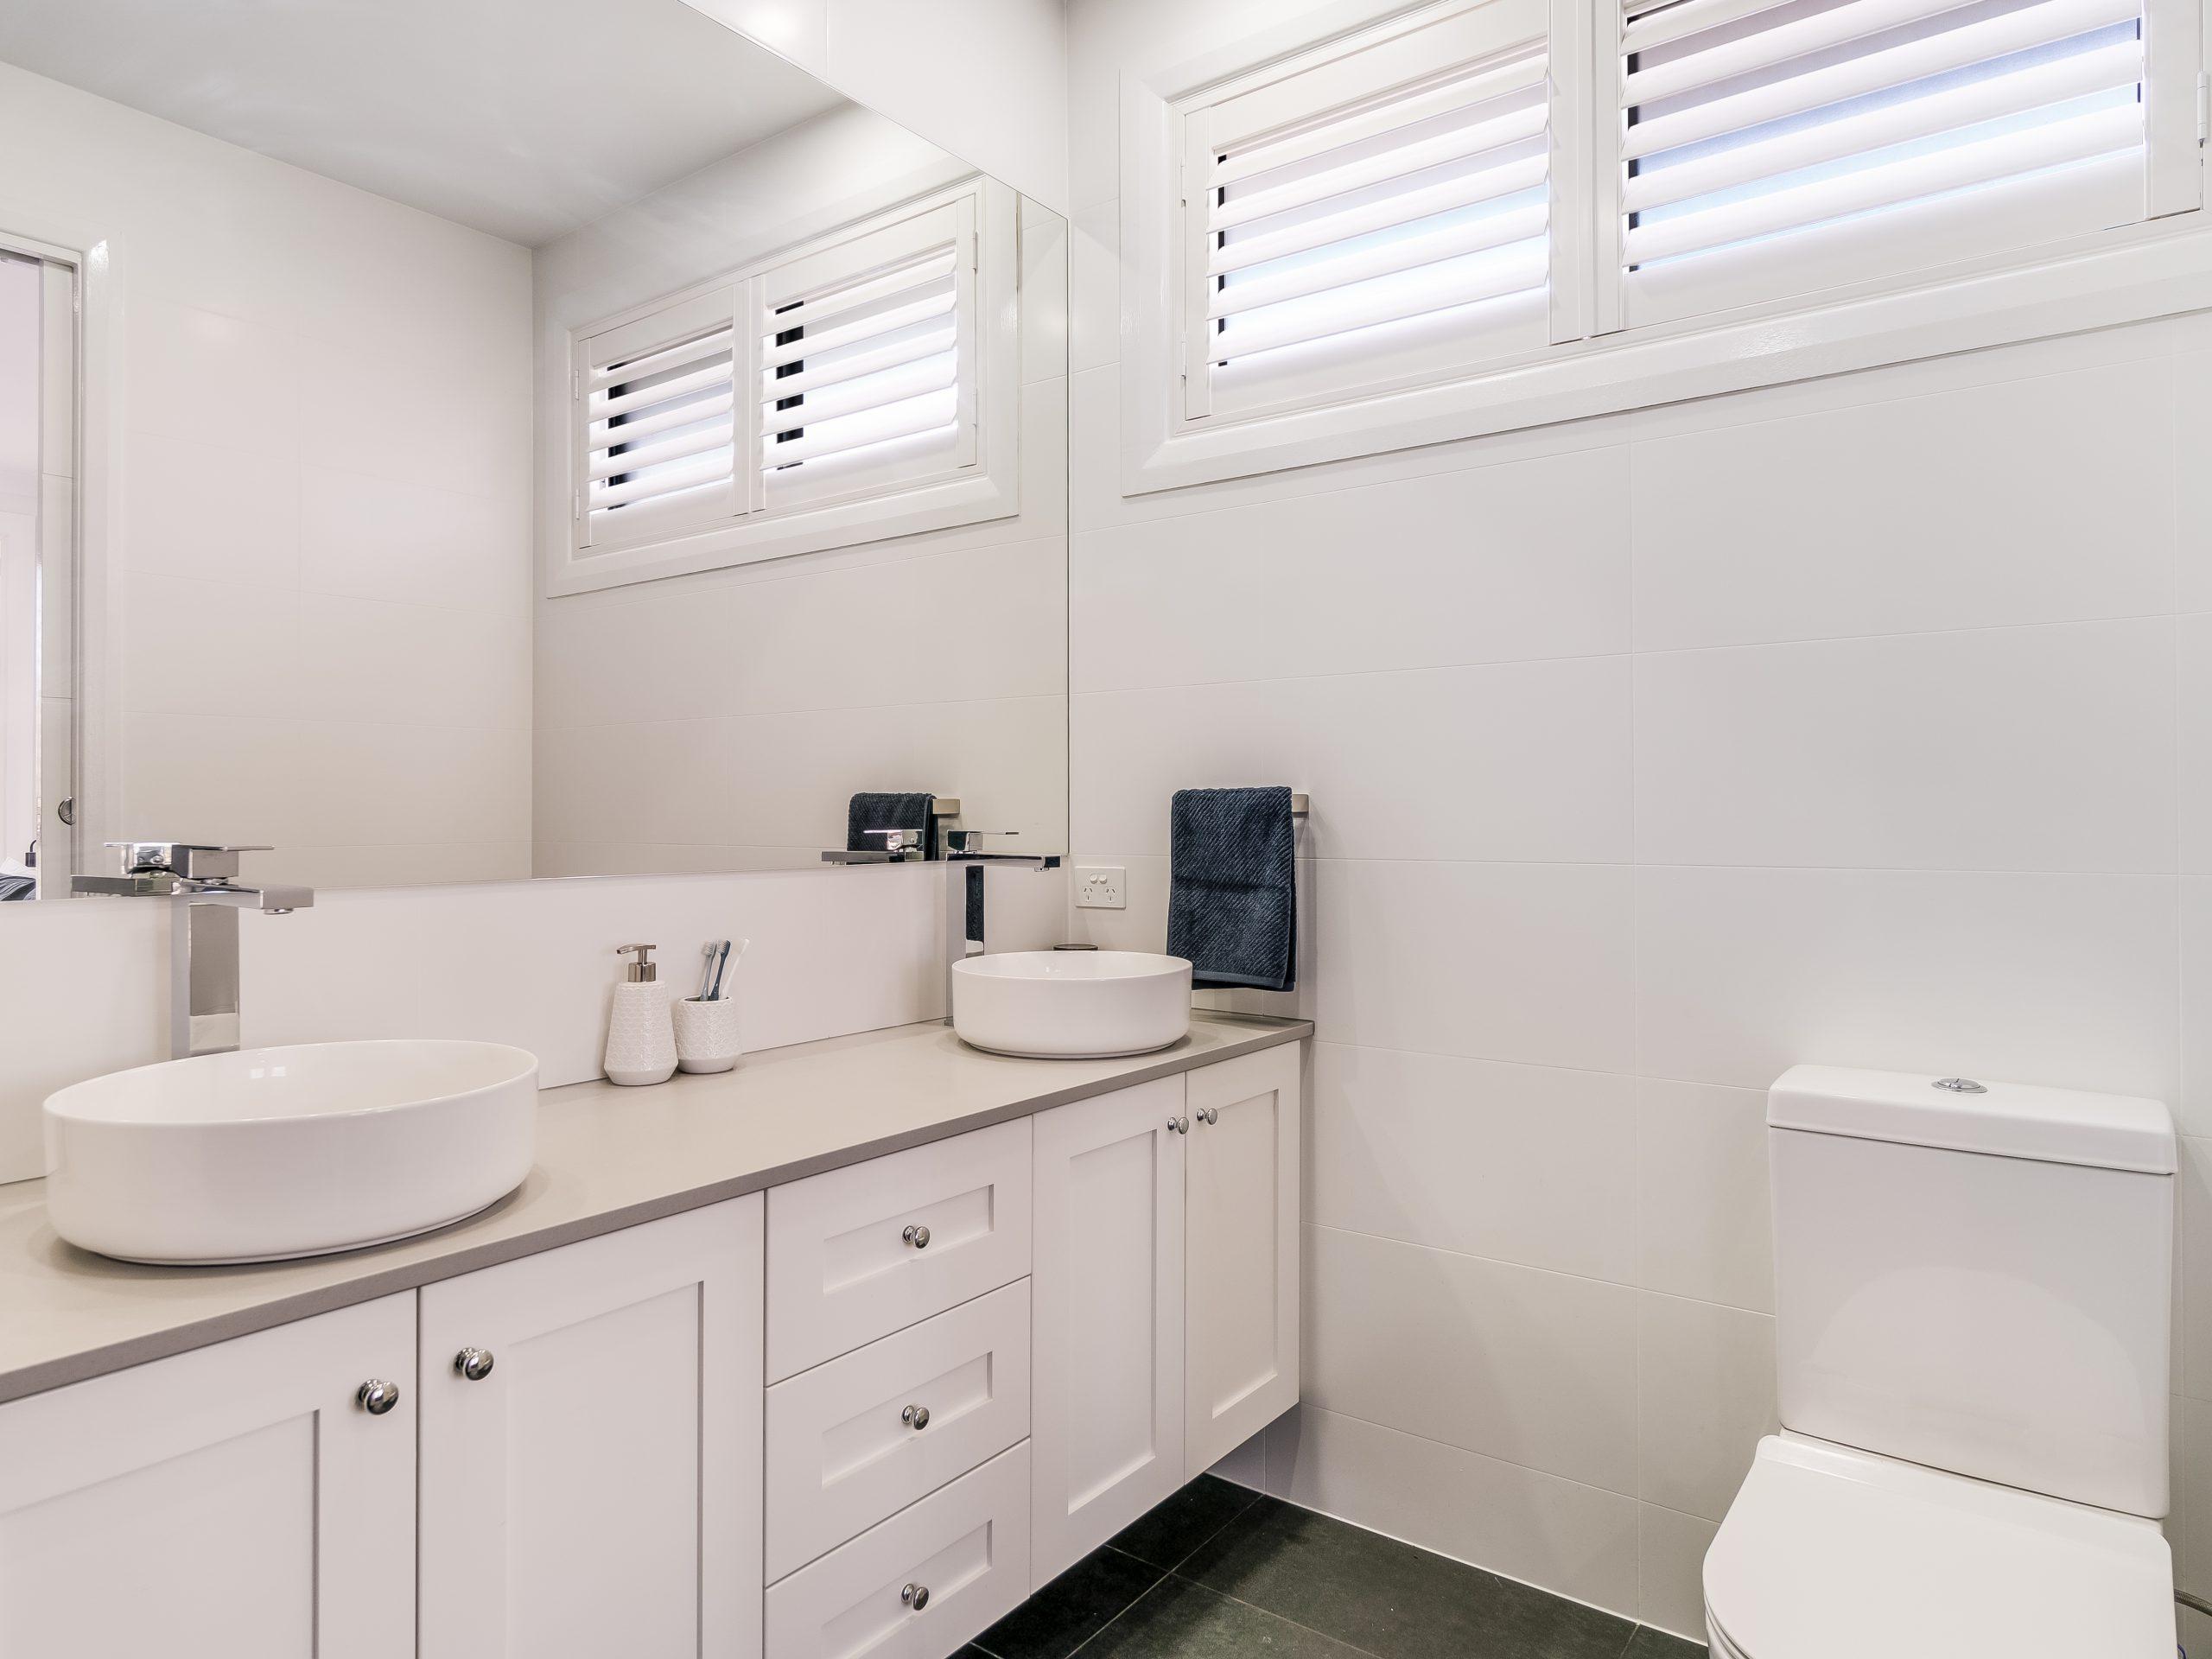 Kidman Park - Kidman - HBC Homes Adelaide - _DSC1168